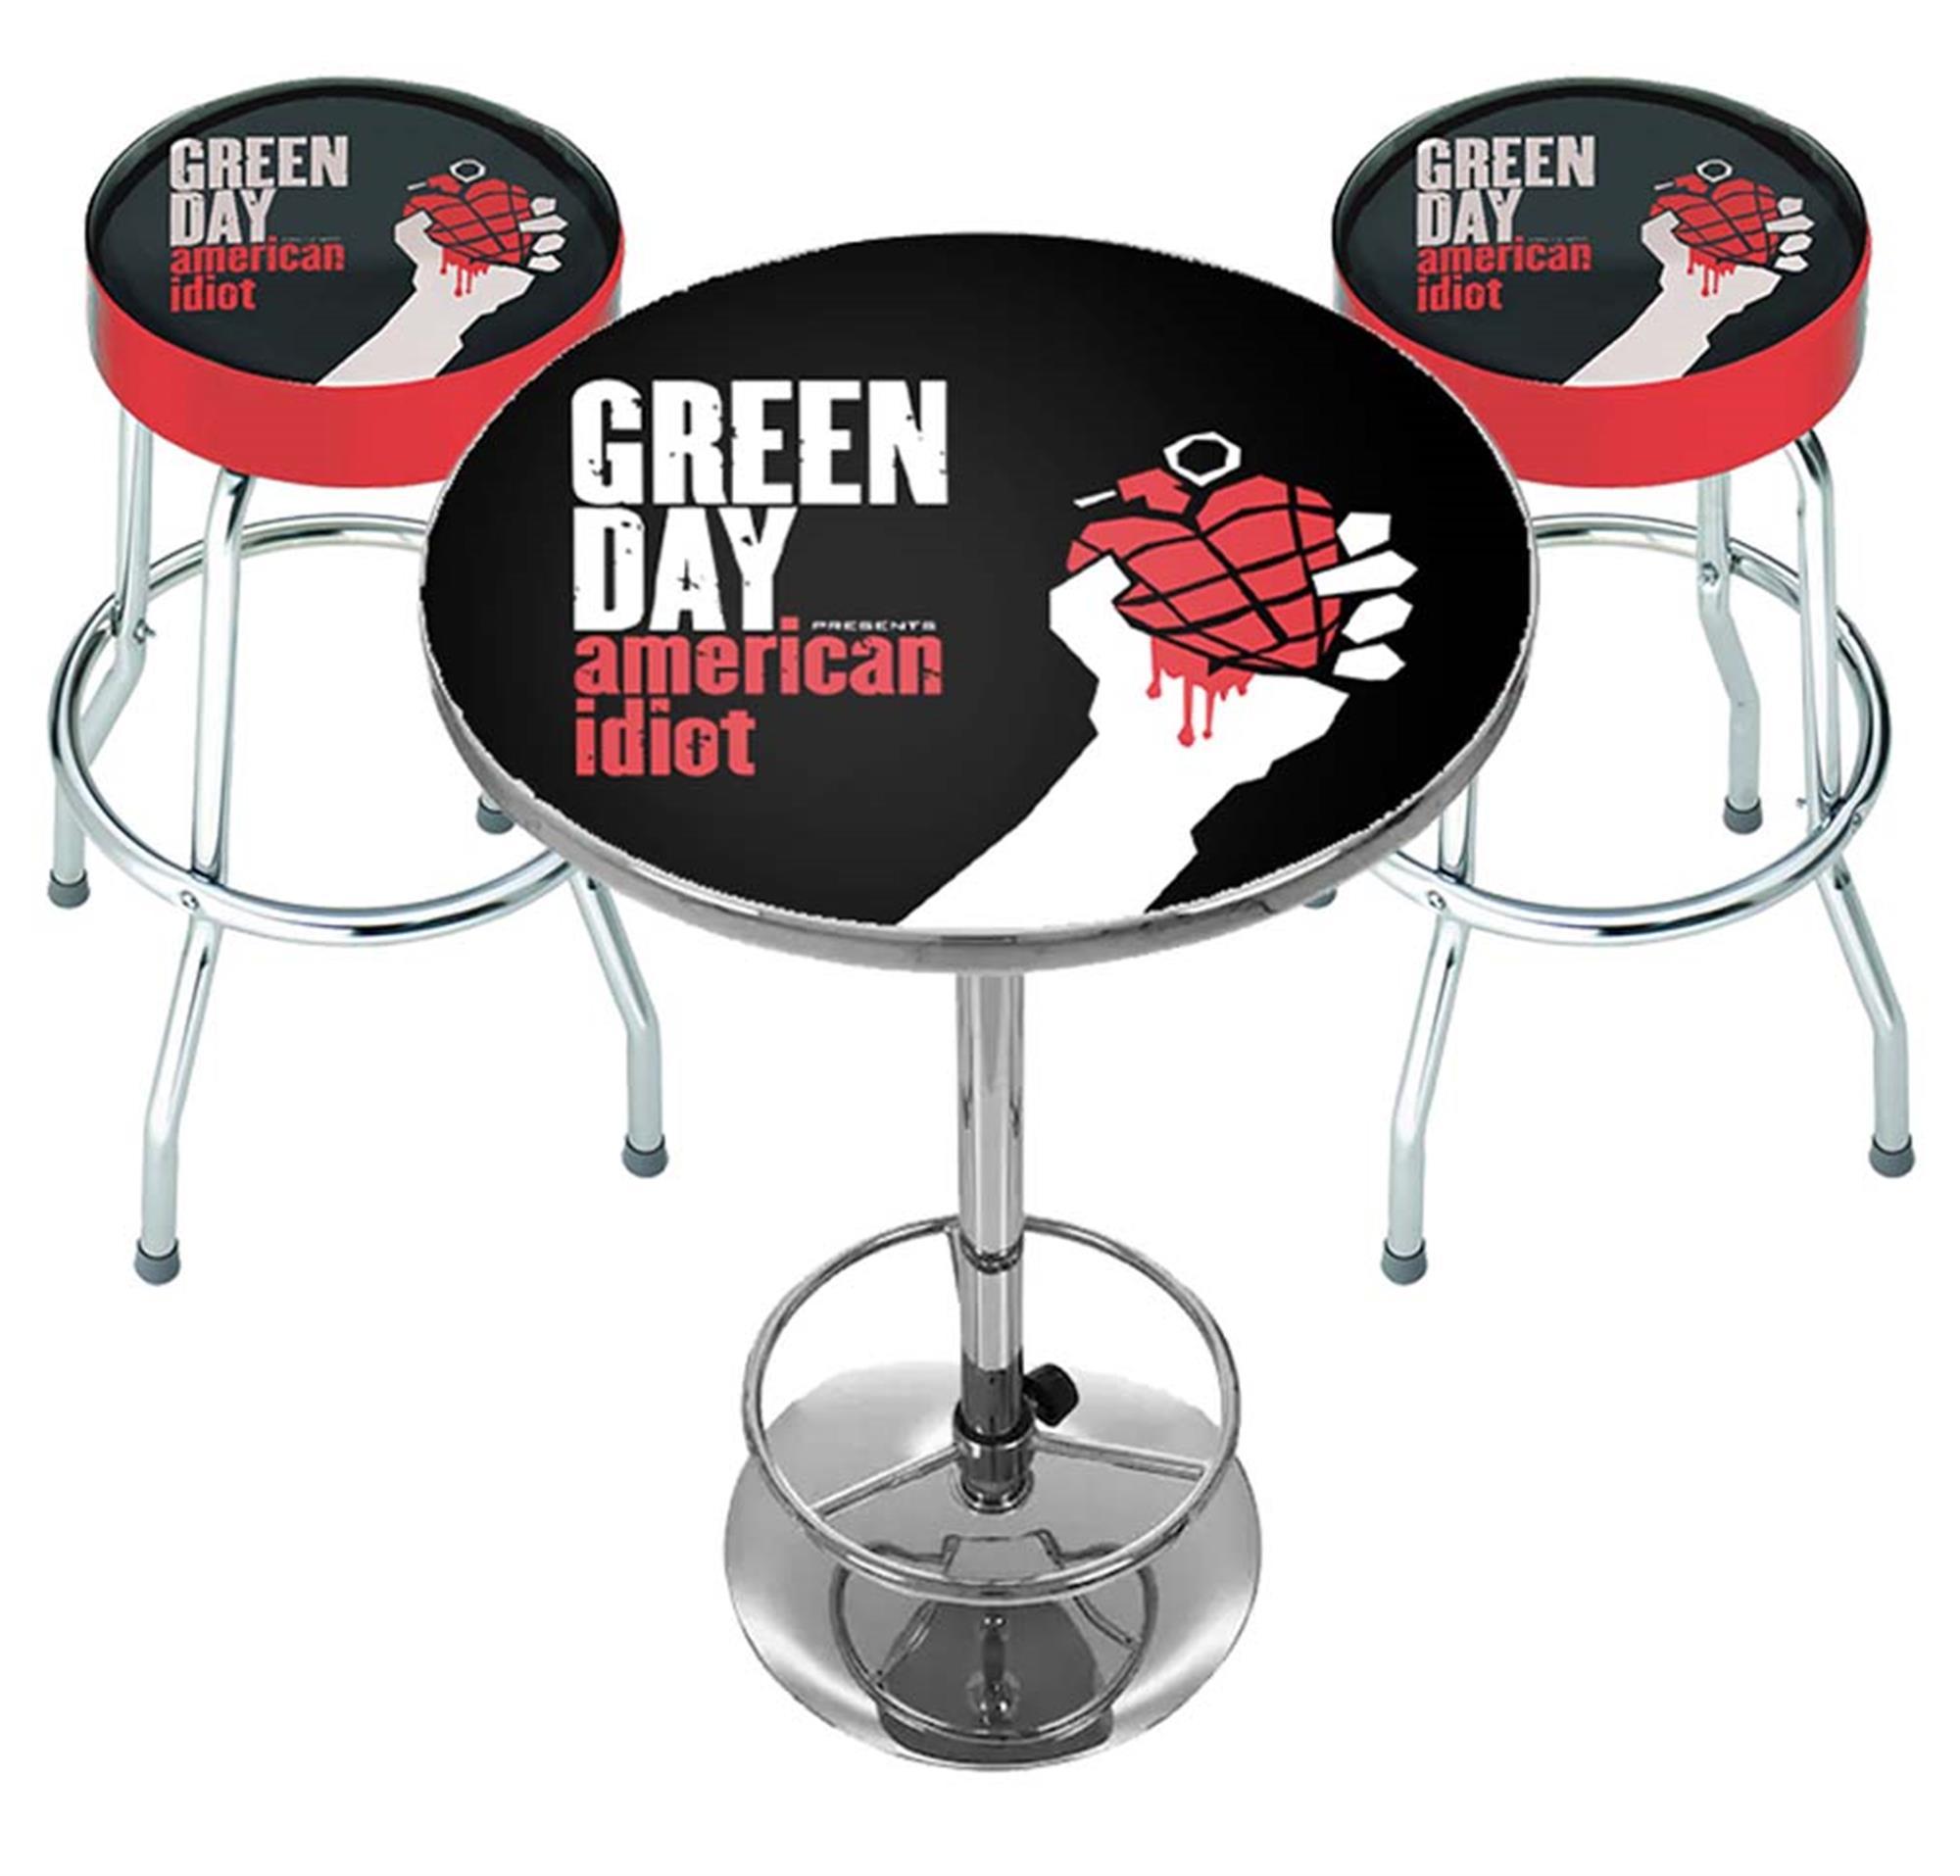 Green Day American Idiot Bar Set